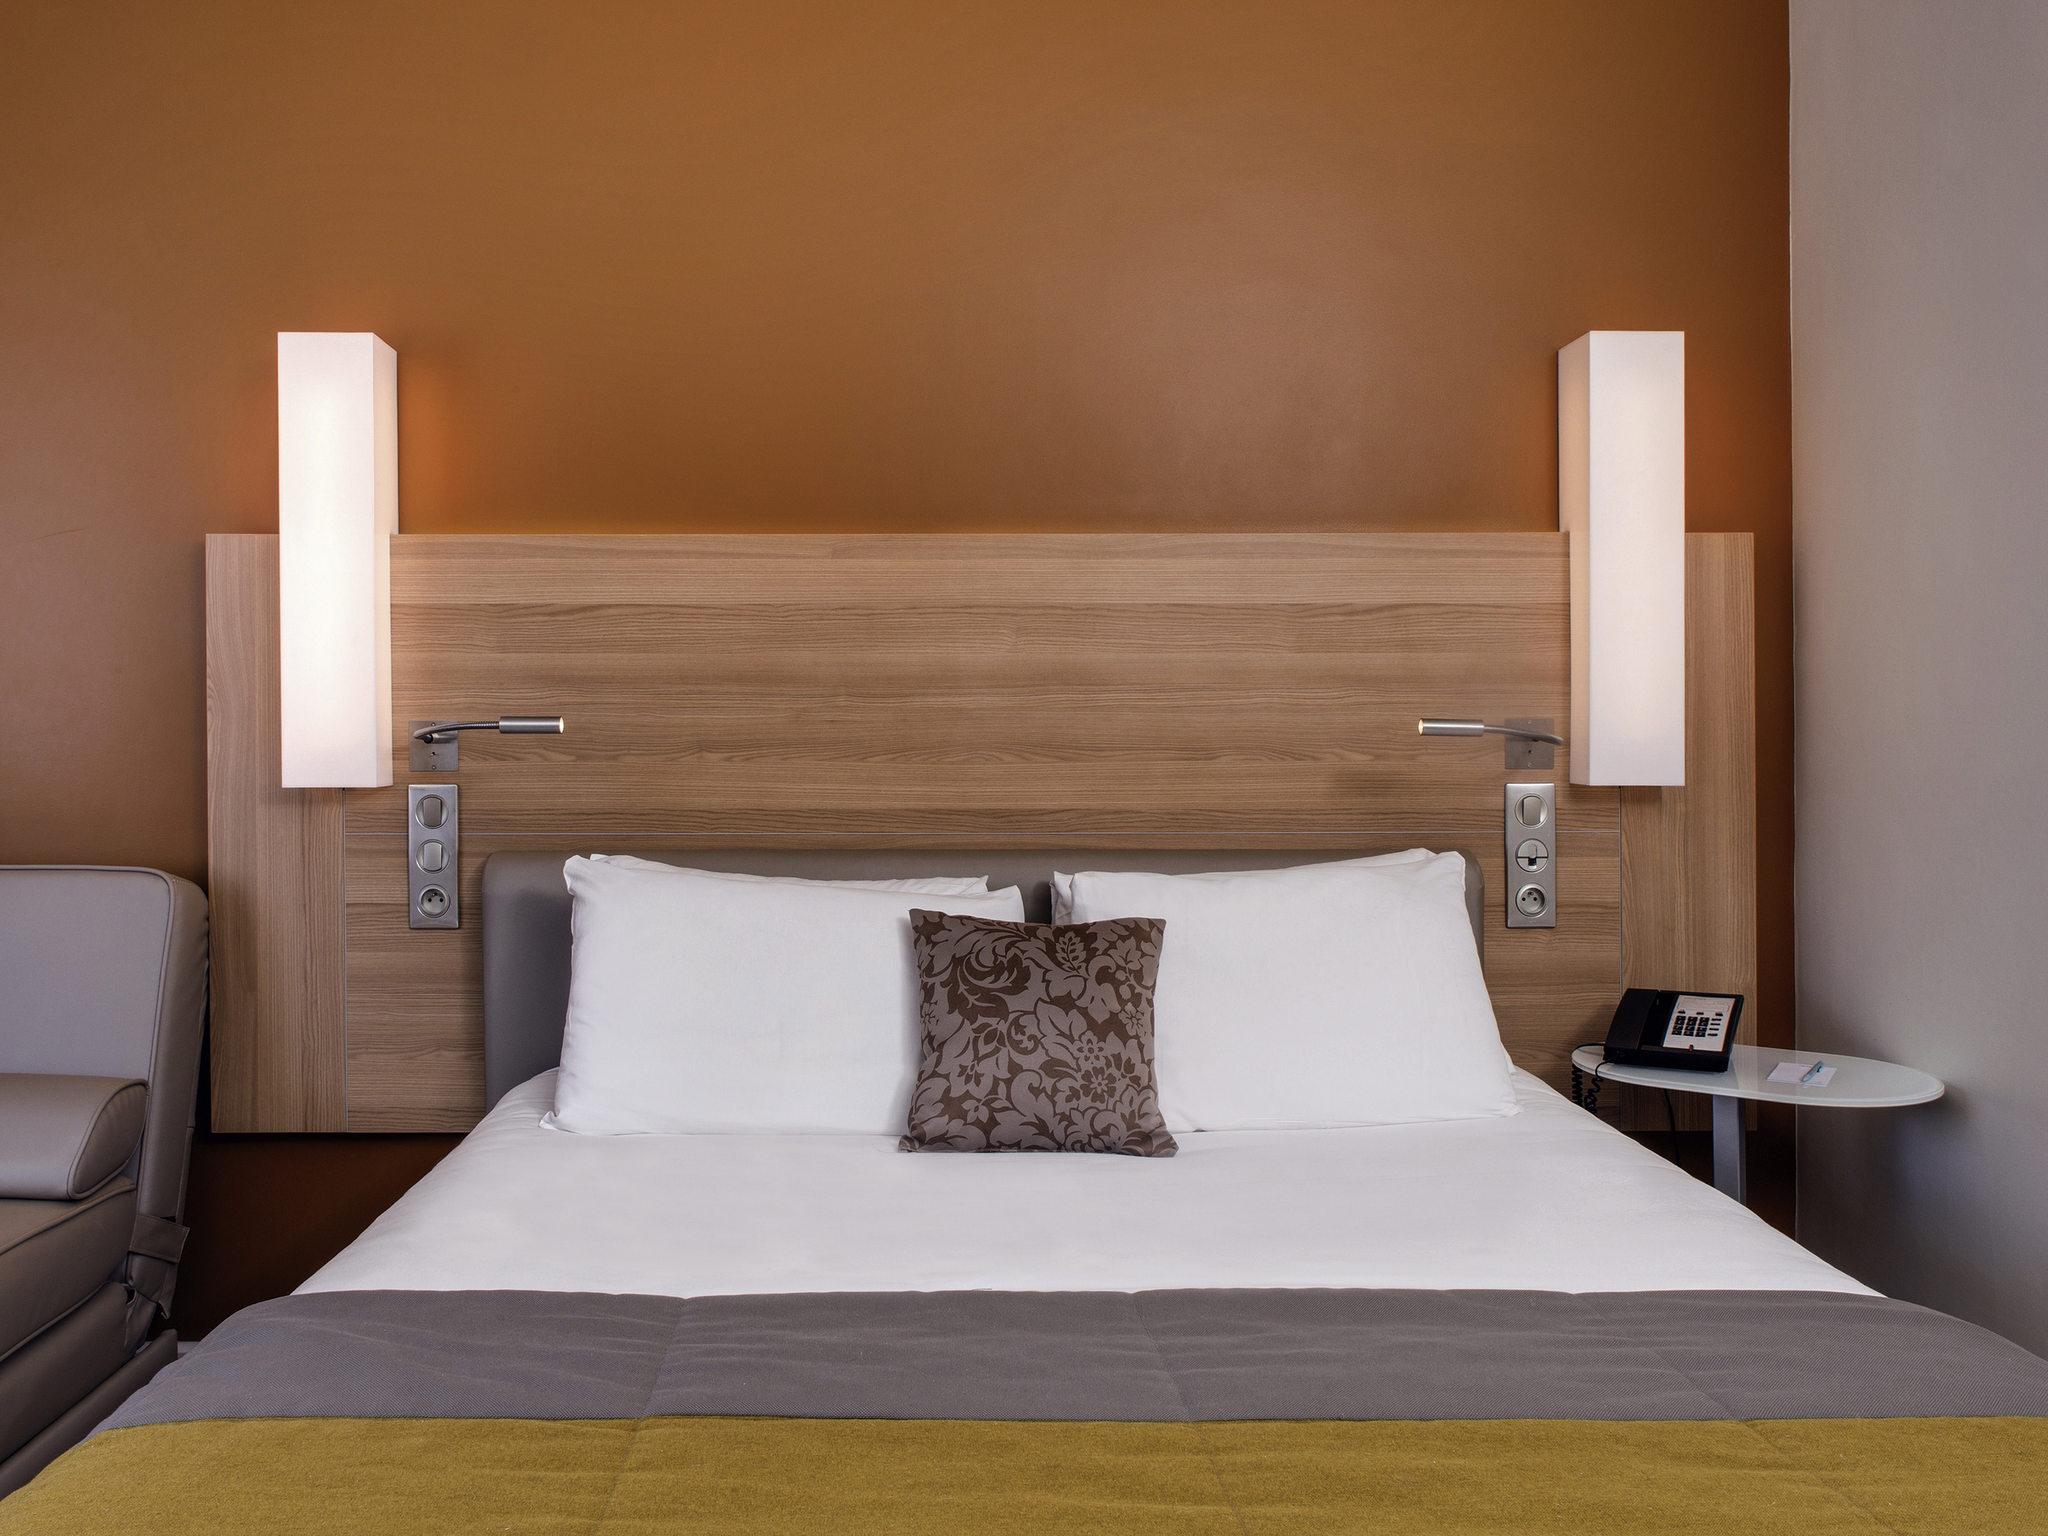 Hotel – Hôtel Mercure Mâcon Bord de Saône